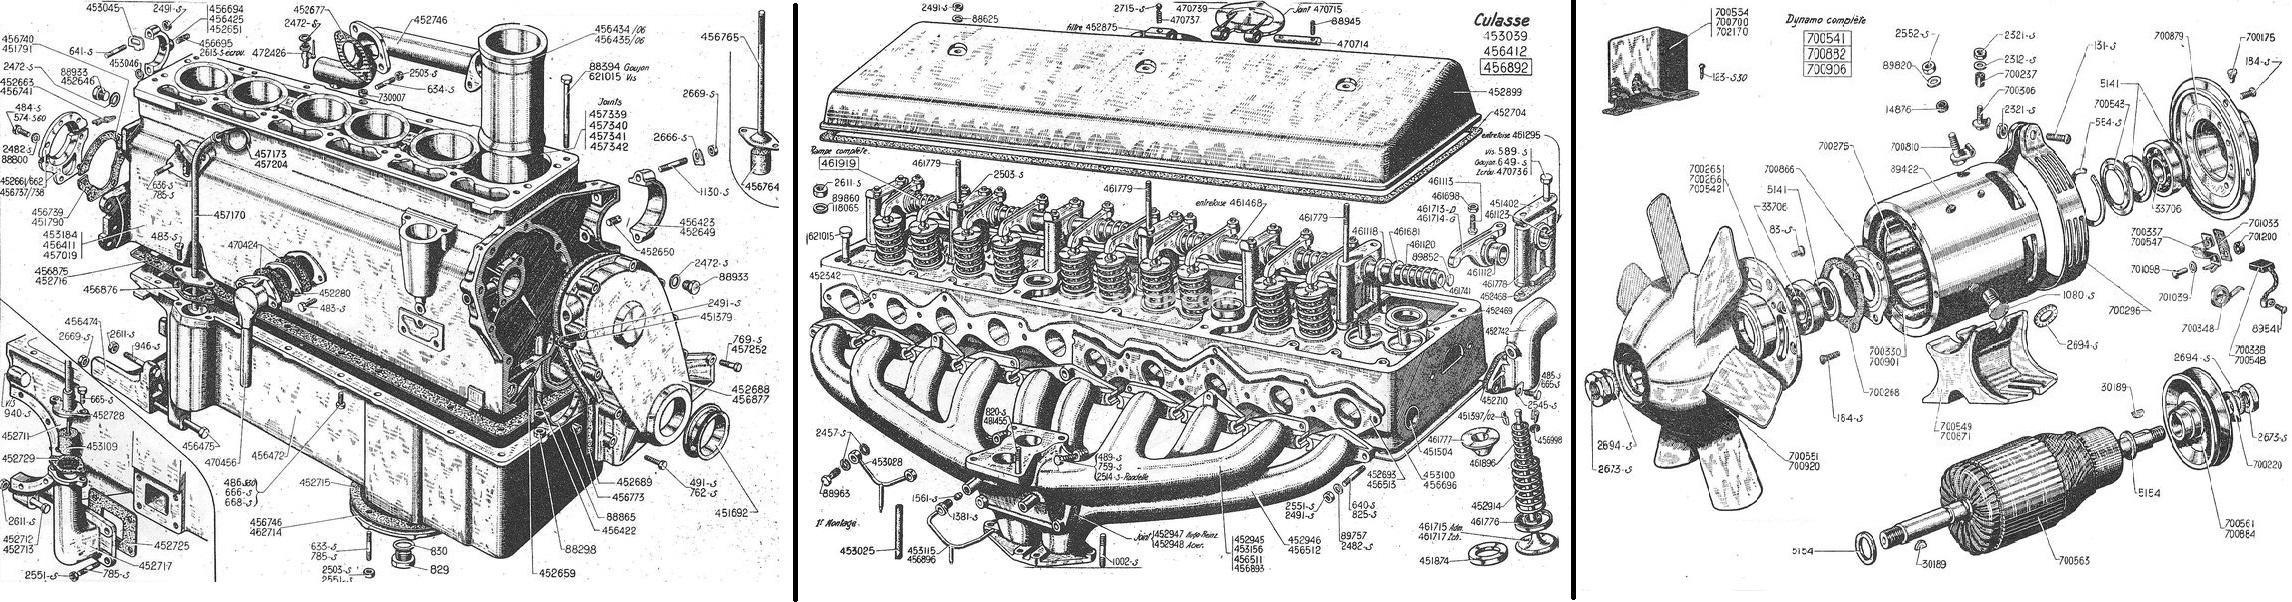 MOTOR + TOEBEHOREN: 15CV COMPLEET